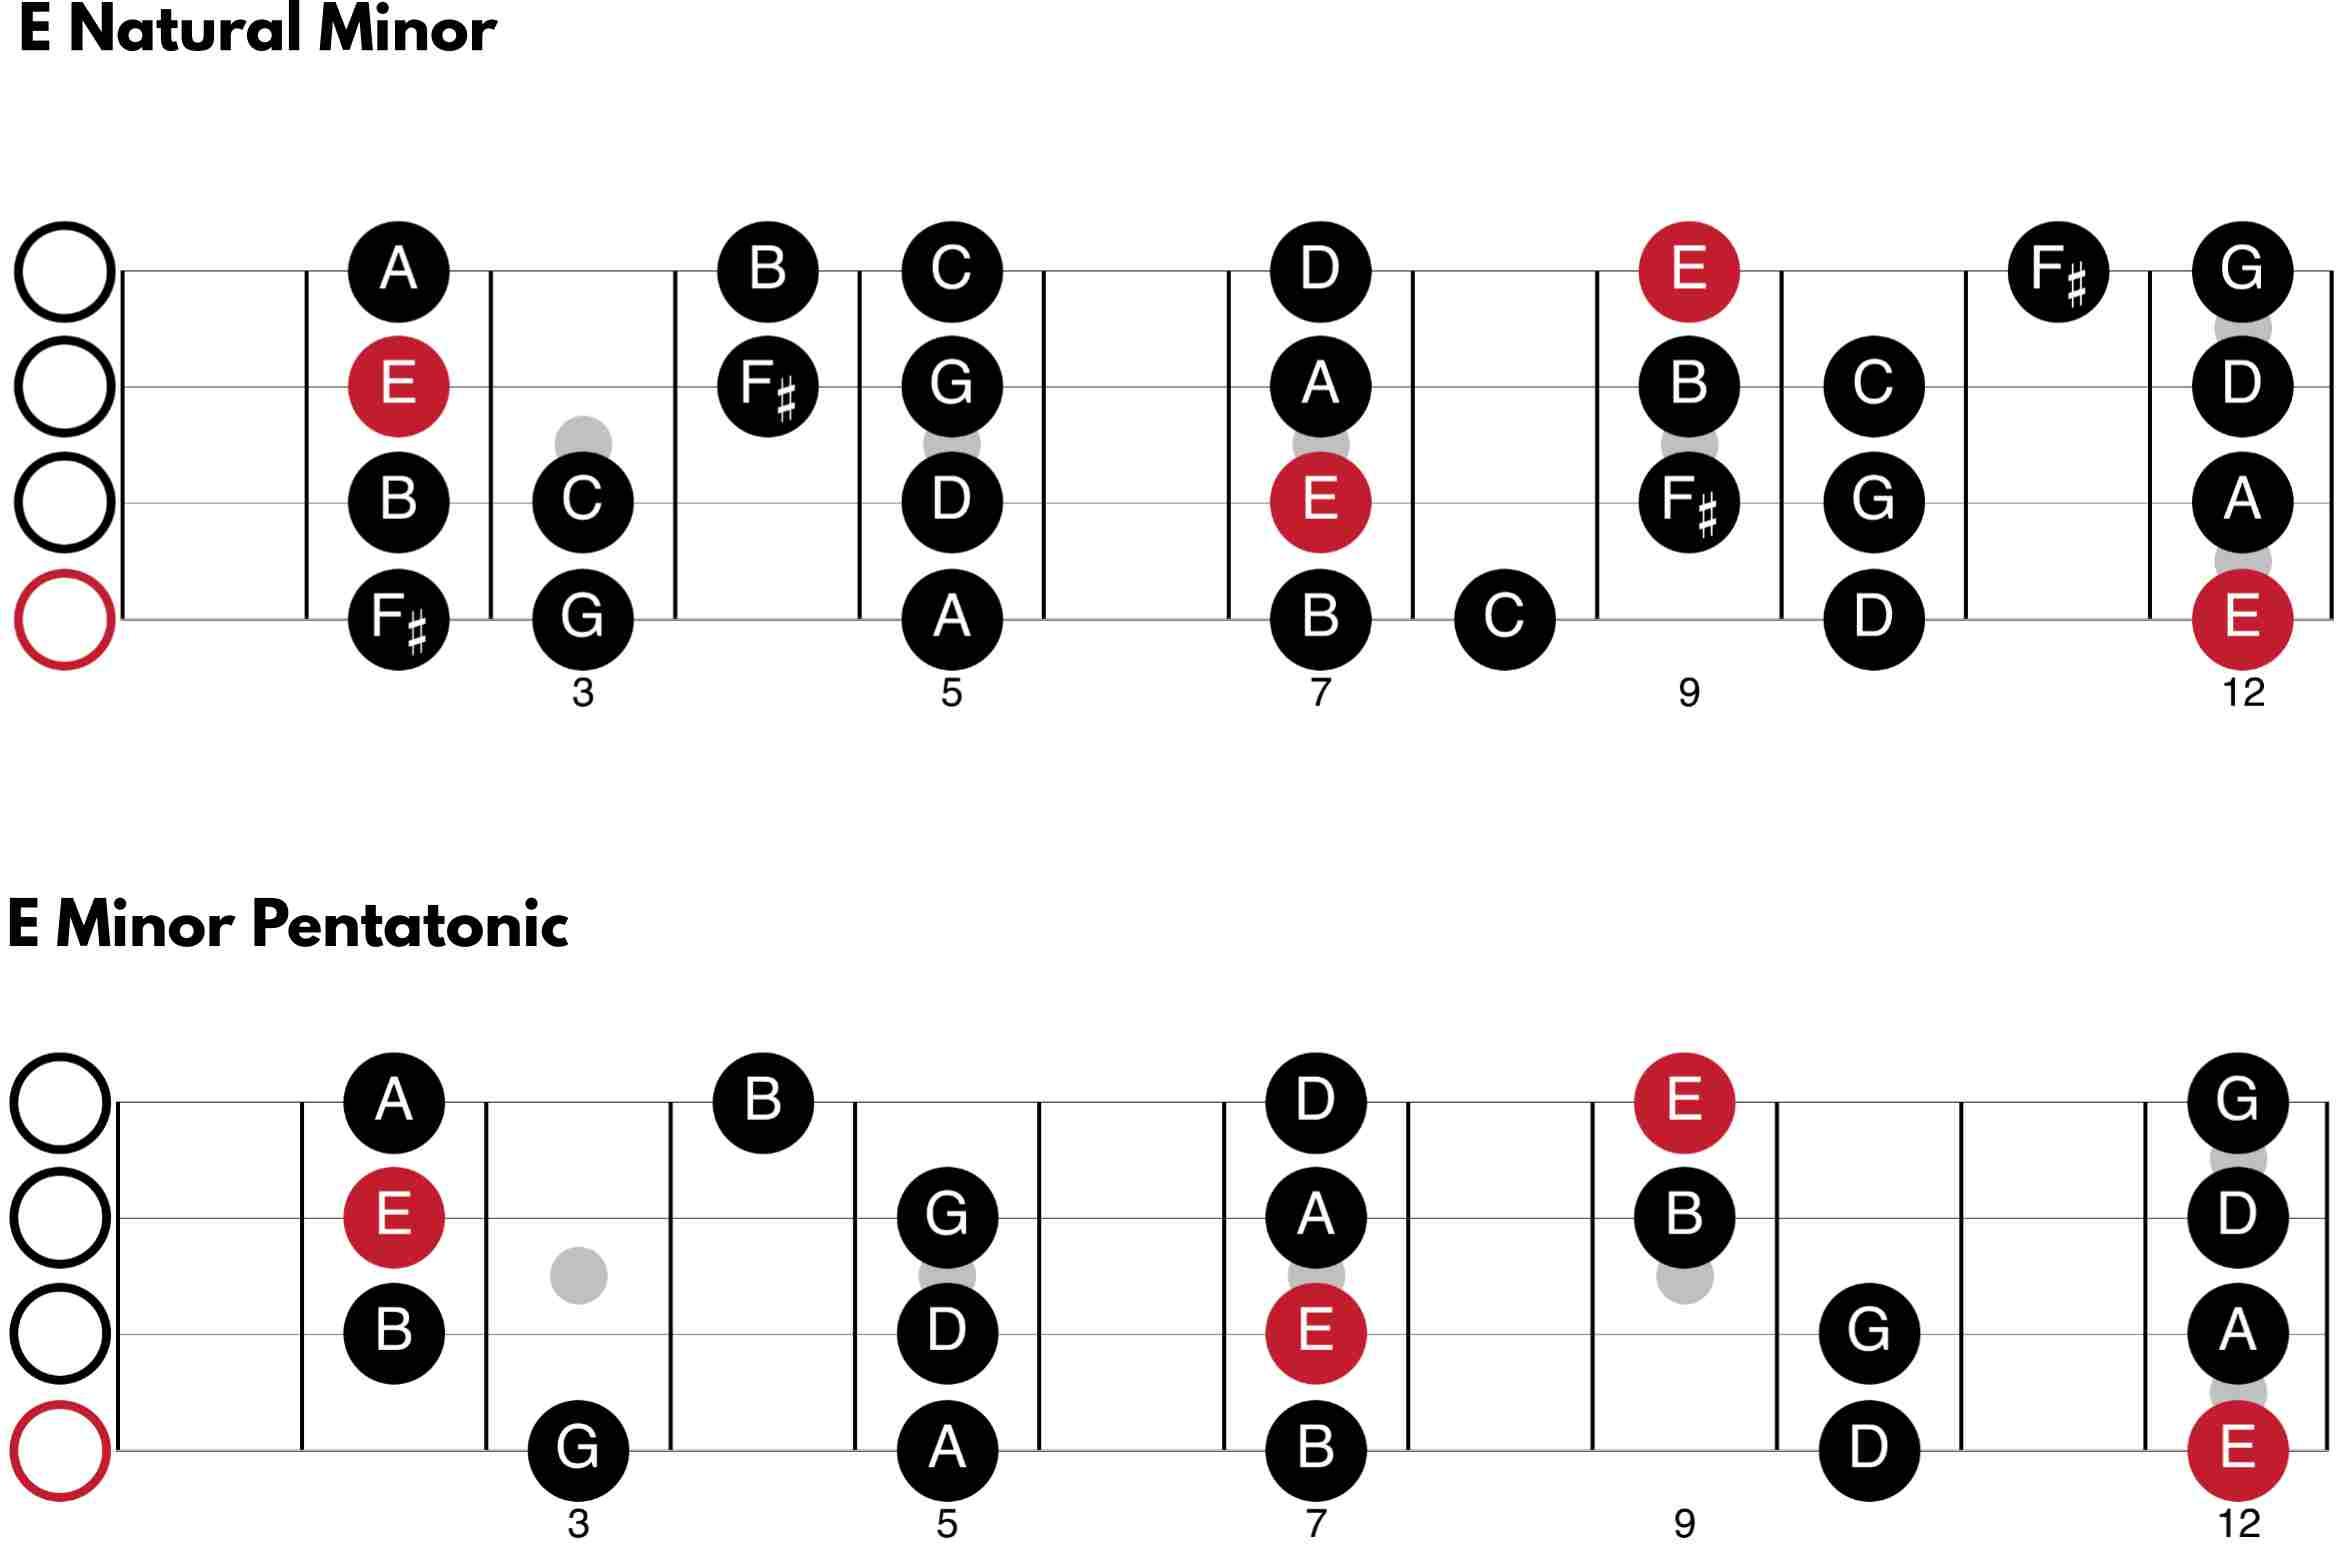 E Natural Minor and E Minor Pentatonic for Bass Guitar